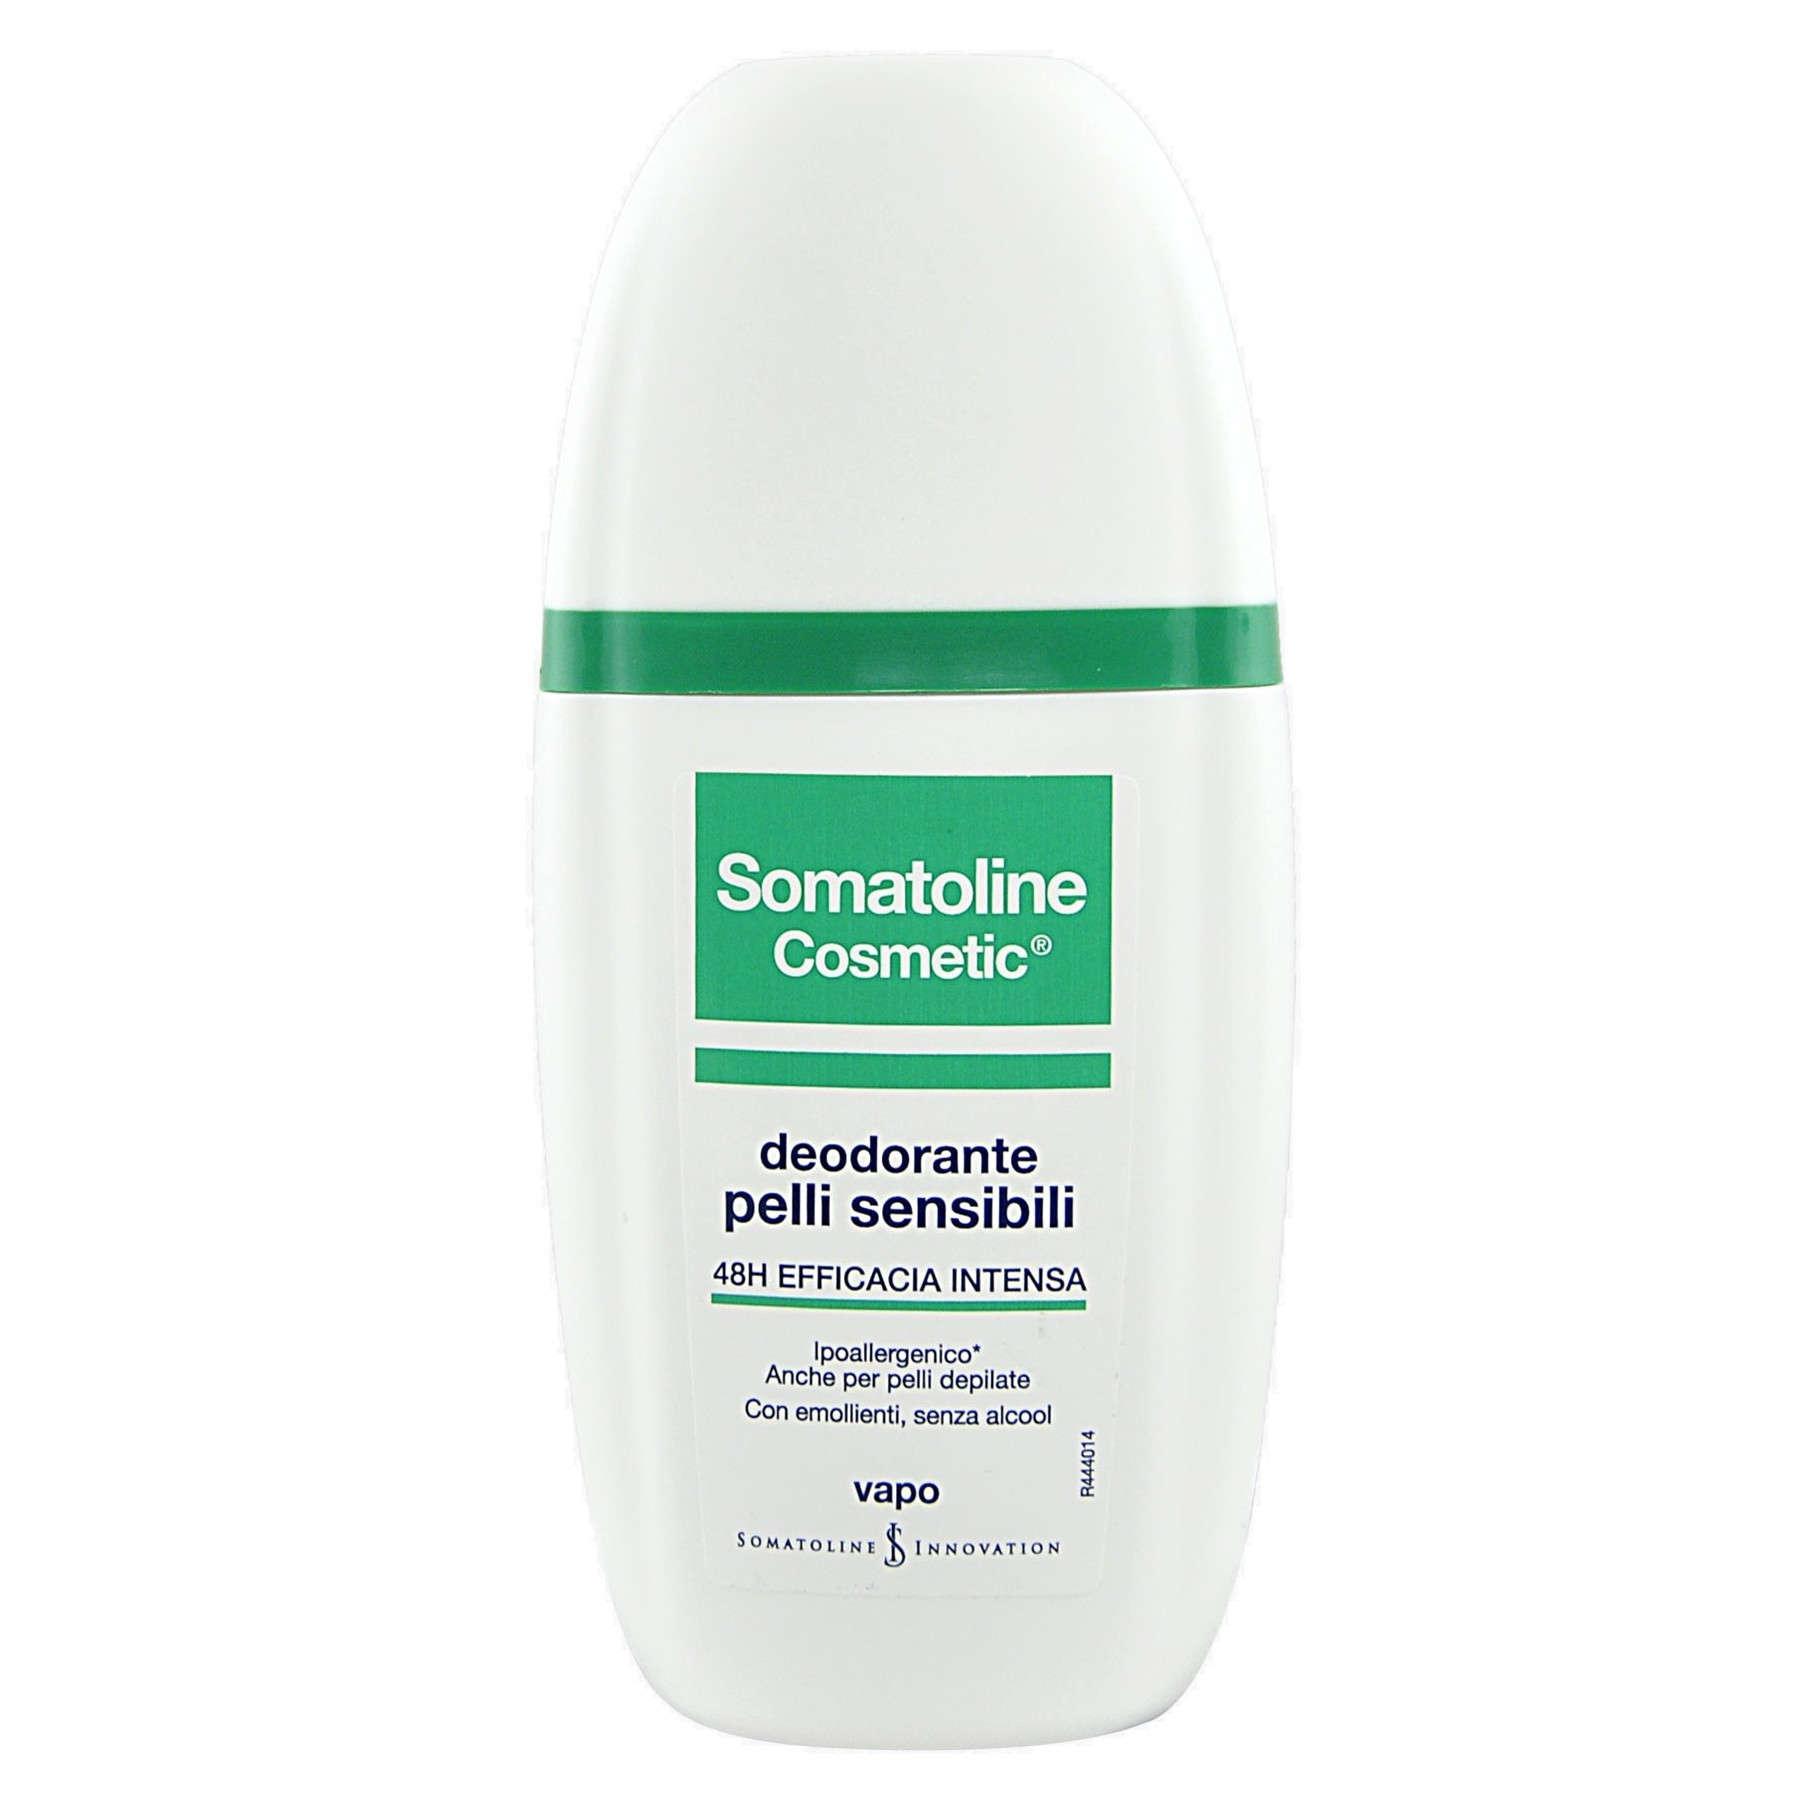 Somatoline - Deodorante Vapo - Pelle sensibile o depilata